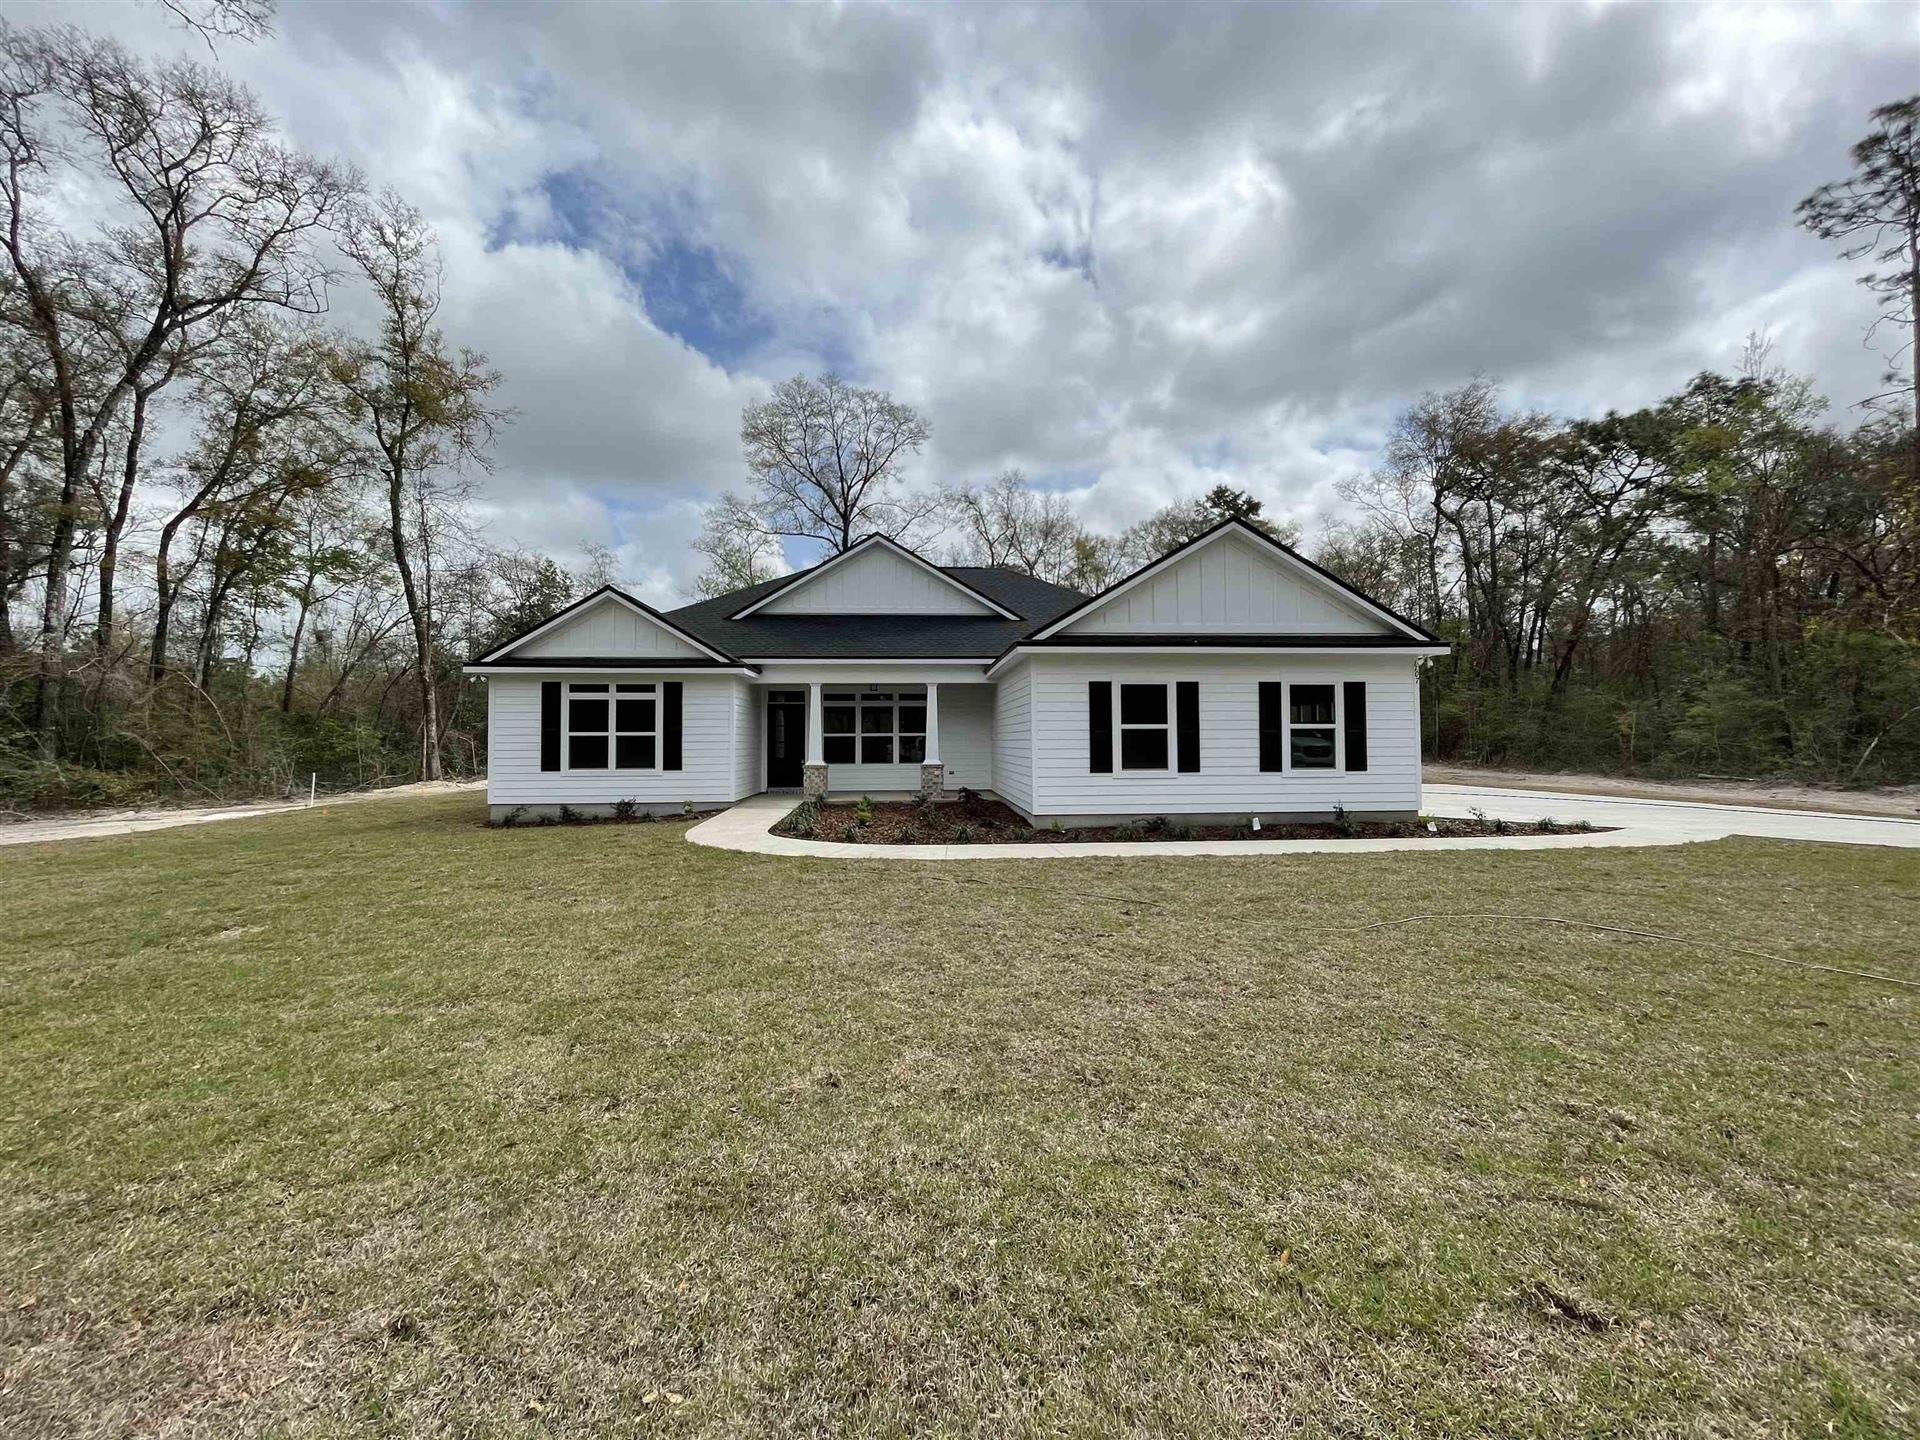 Photo of XXX Old Bethel Road, CRAWFORDVILLE, FL 32327 (MLS # 338793)